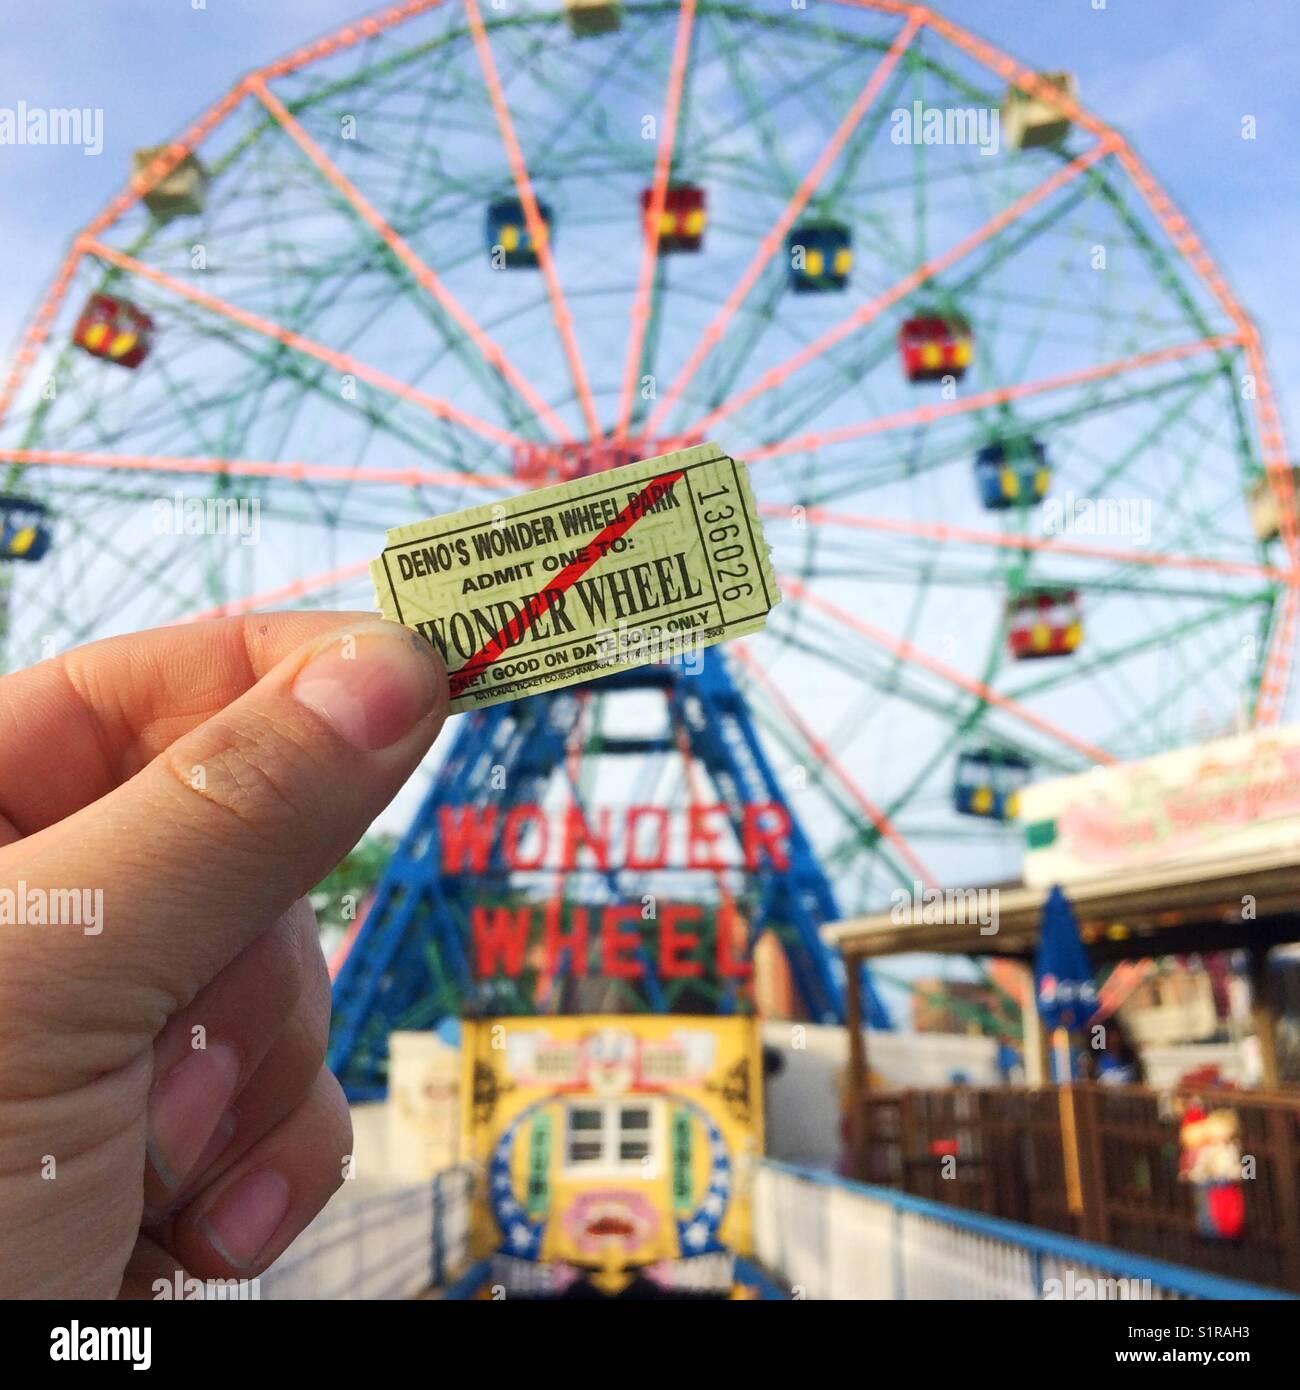 Coney Island Feris Wheel